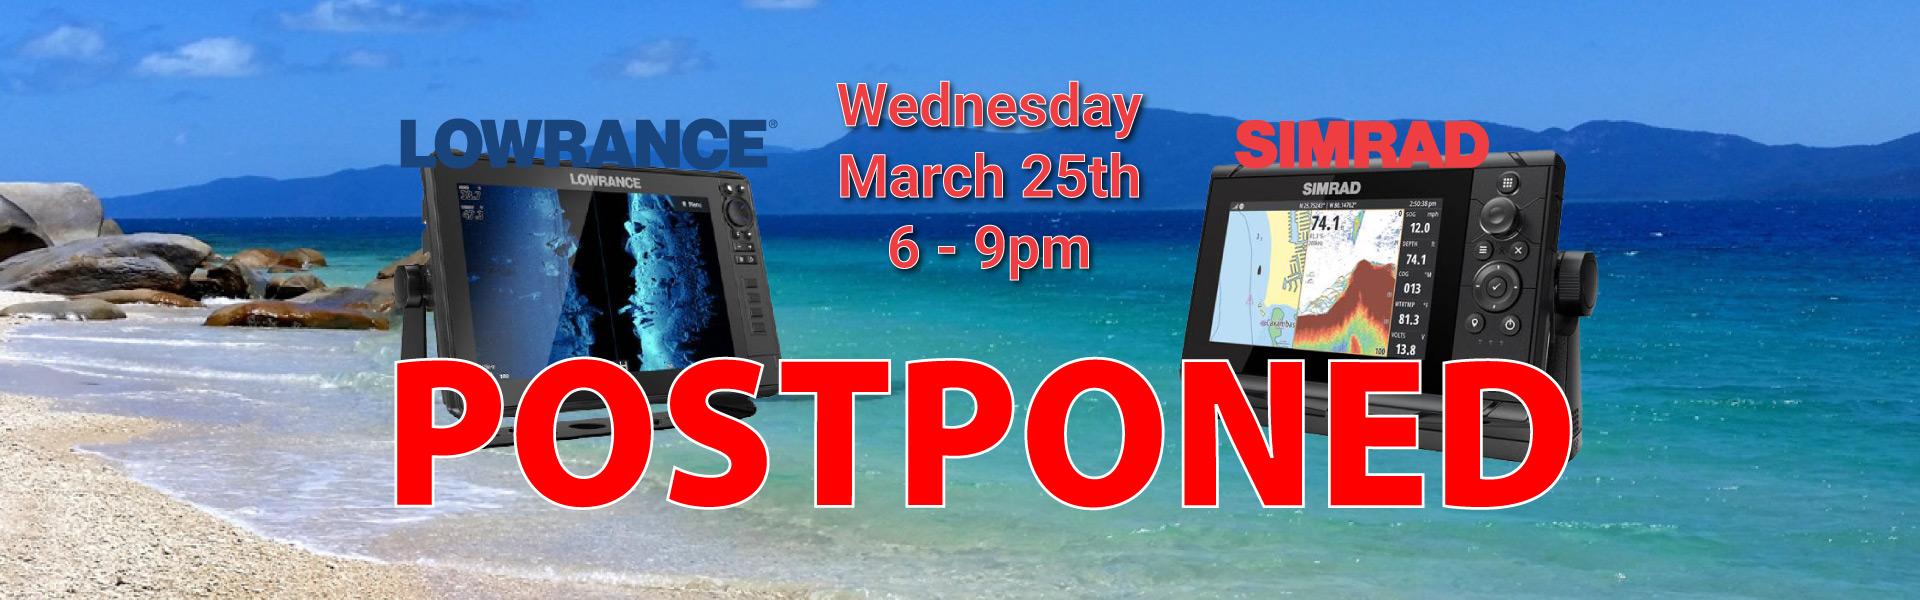 Lowrance Simrad Product Night Postponed